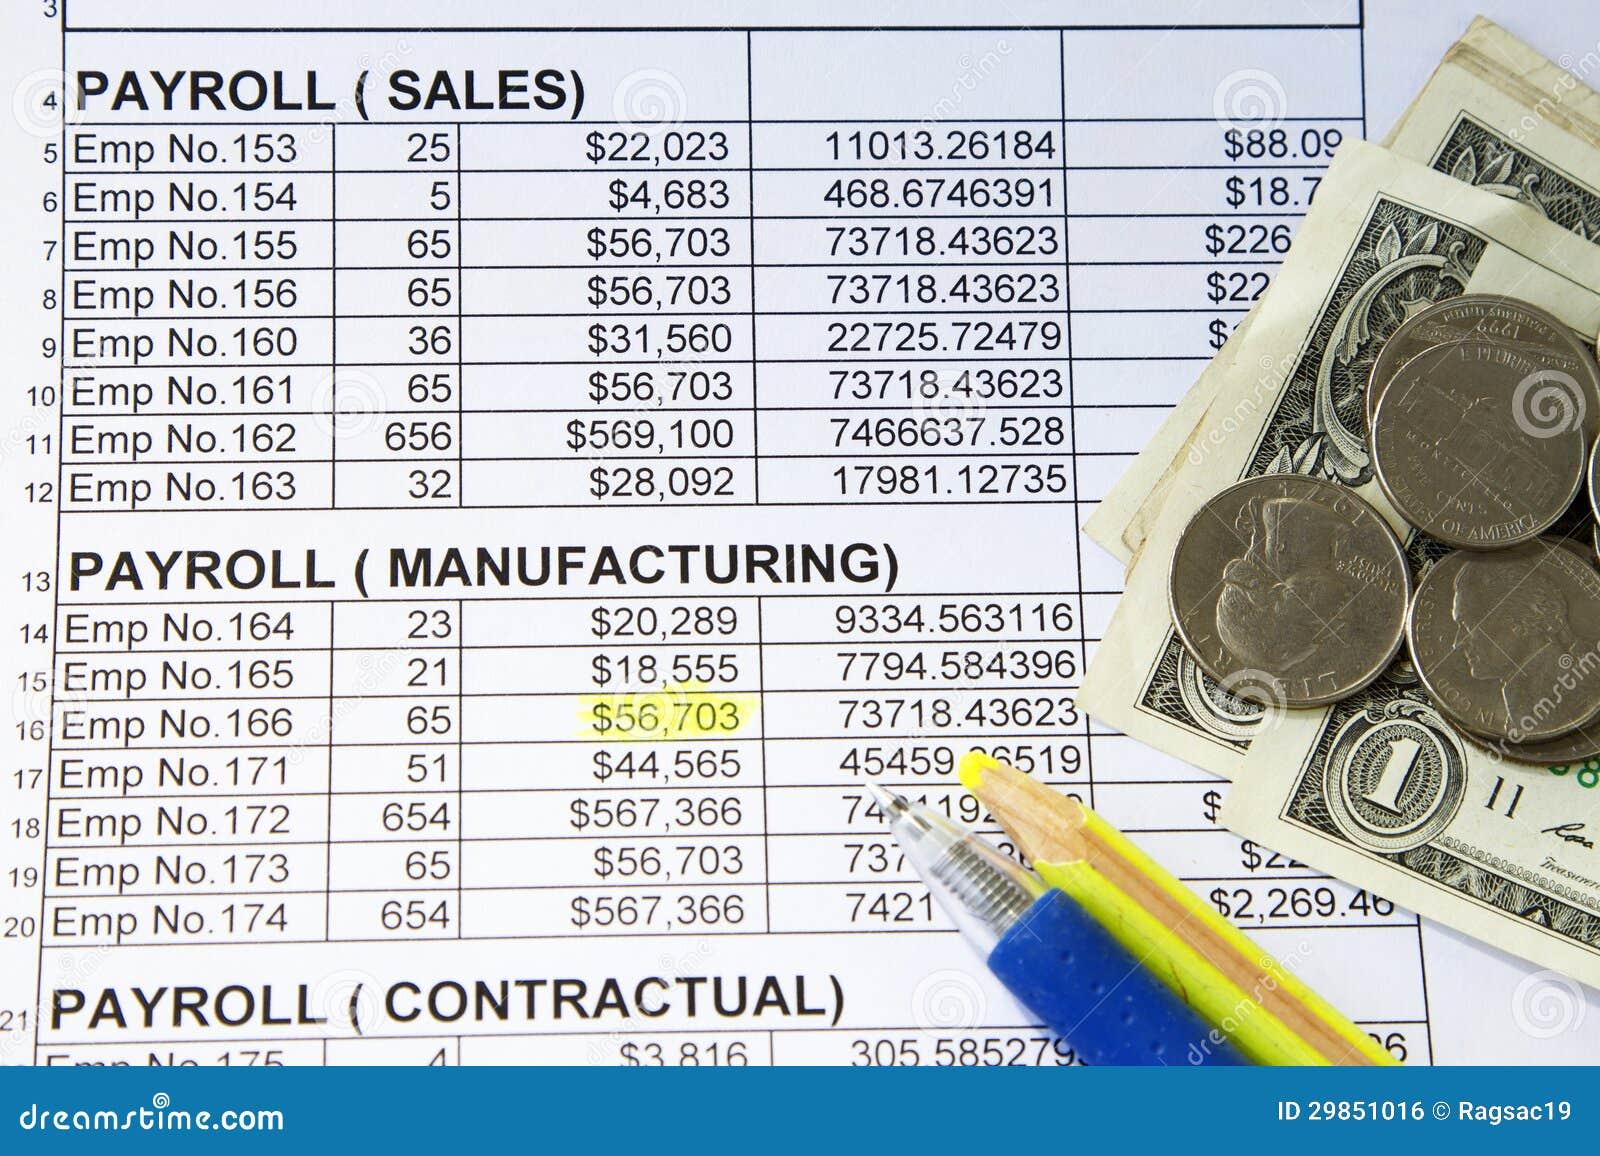 payroll report template